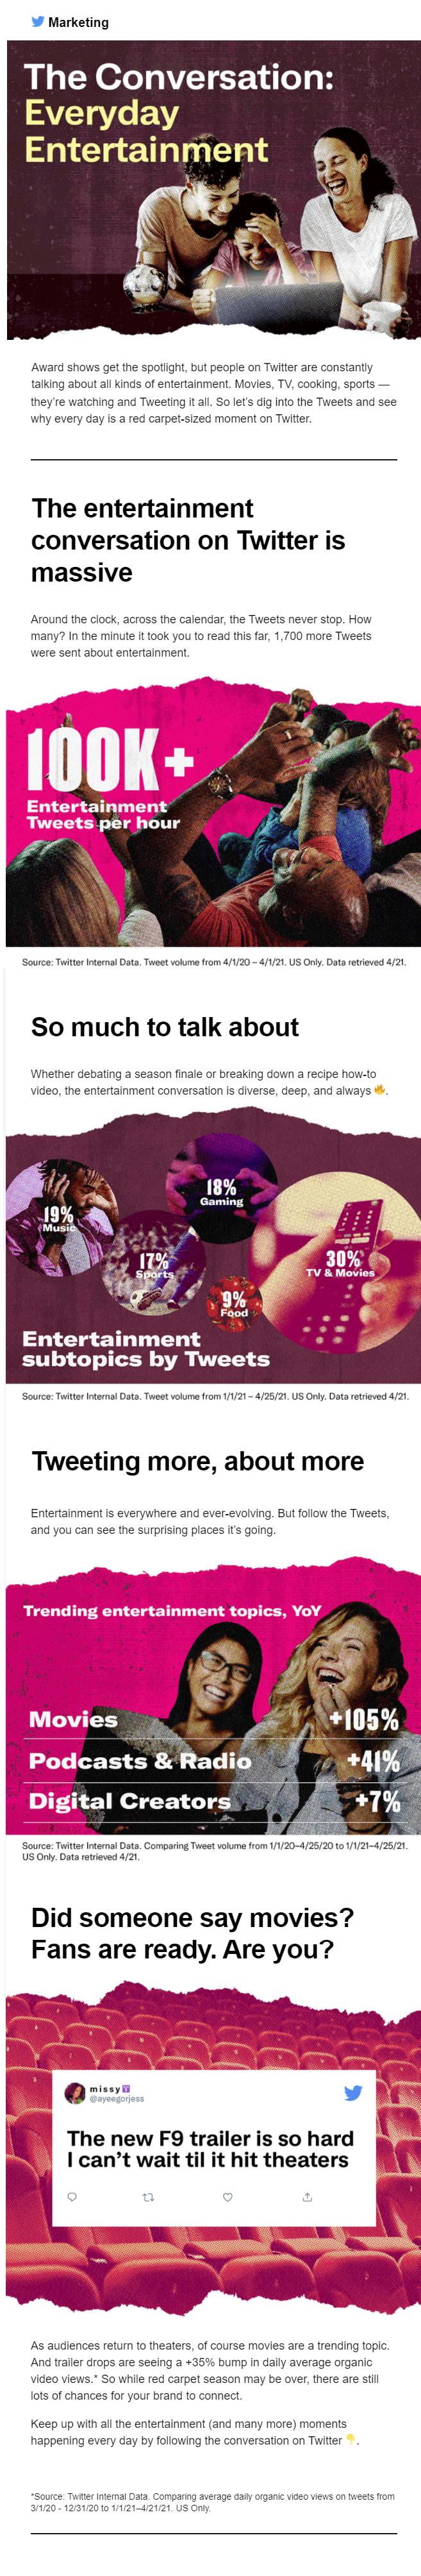 Twitter entertainment trends